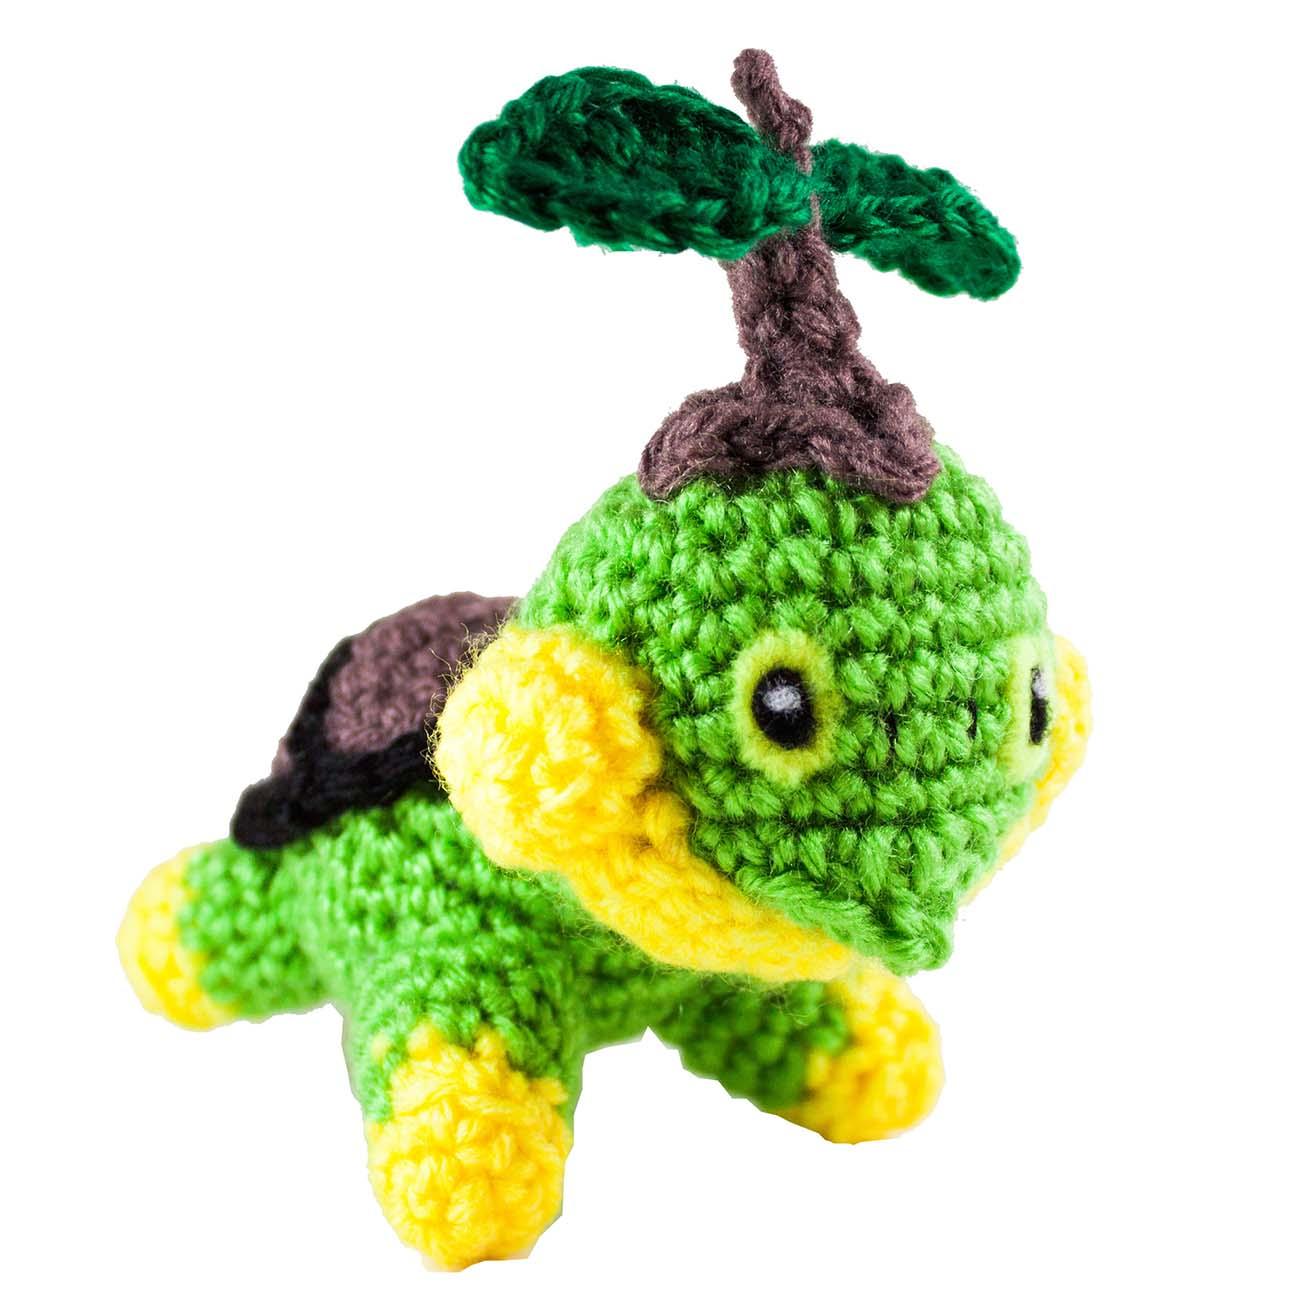 Crochet Turtwig Pattern